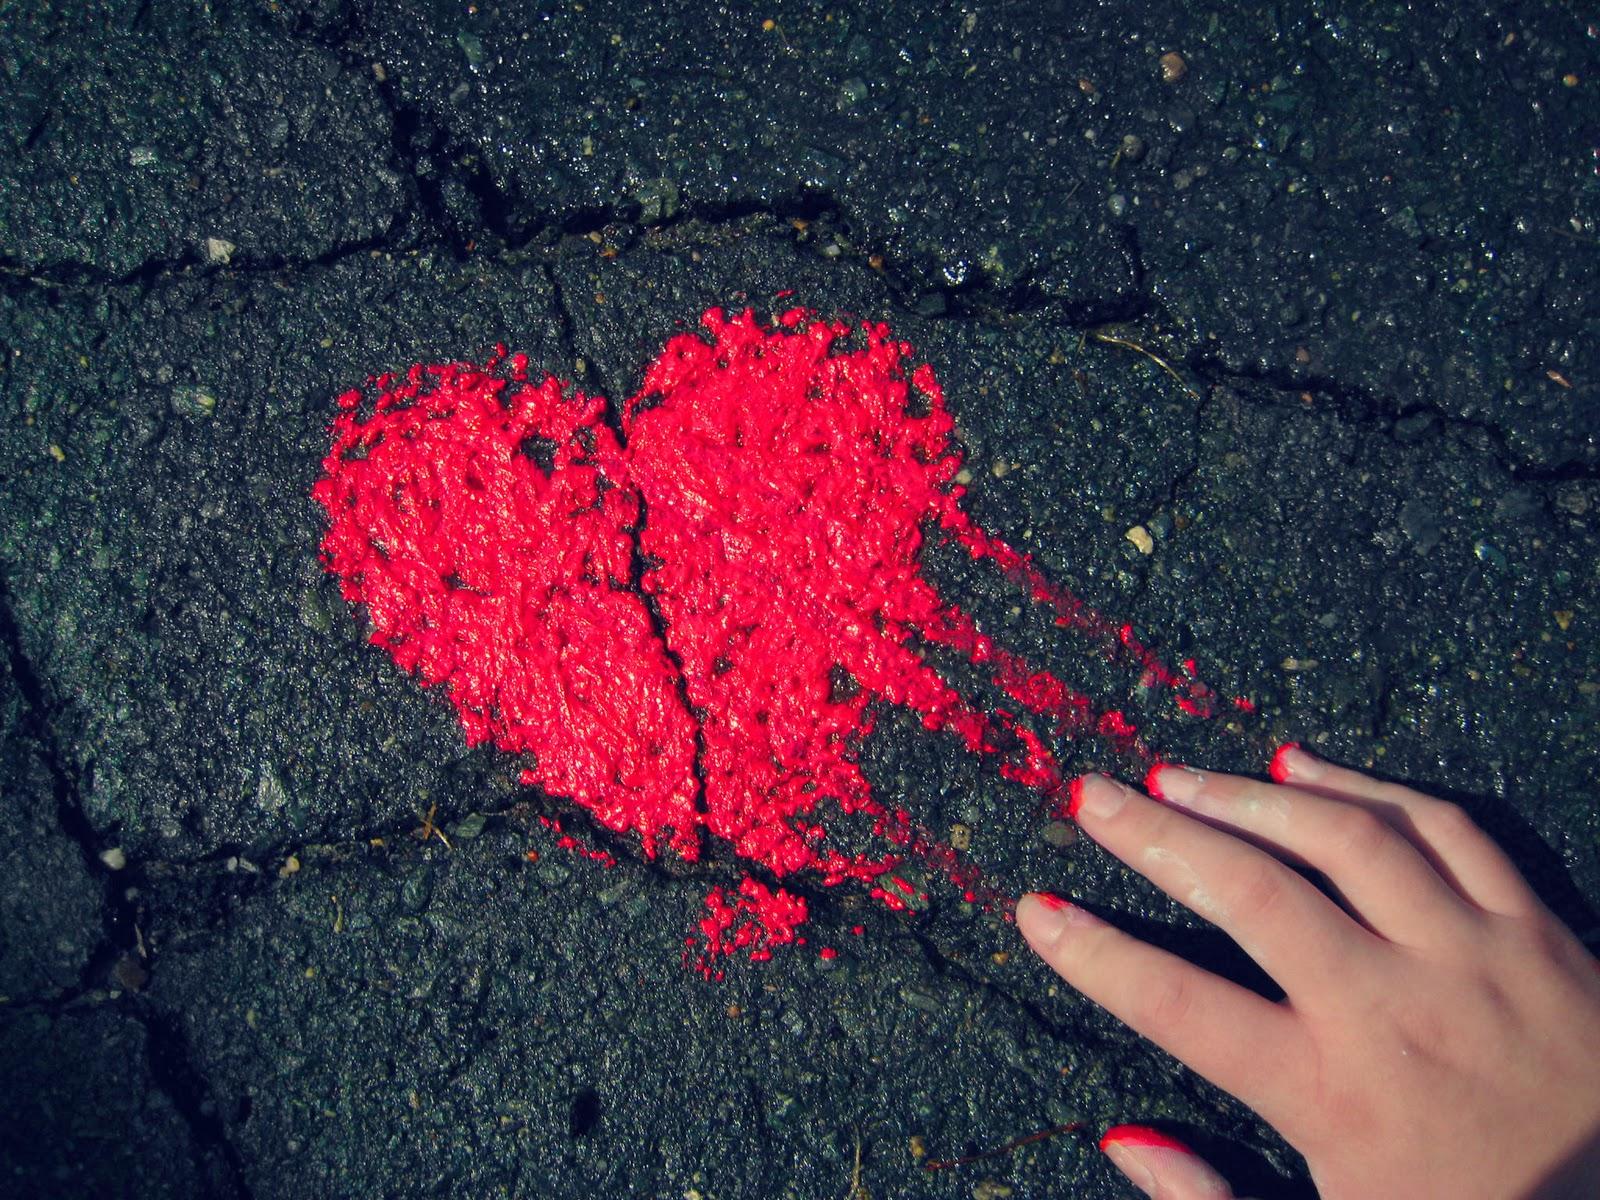 wallpaper hd love,red,carmine,heart,road surface,asphalt